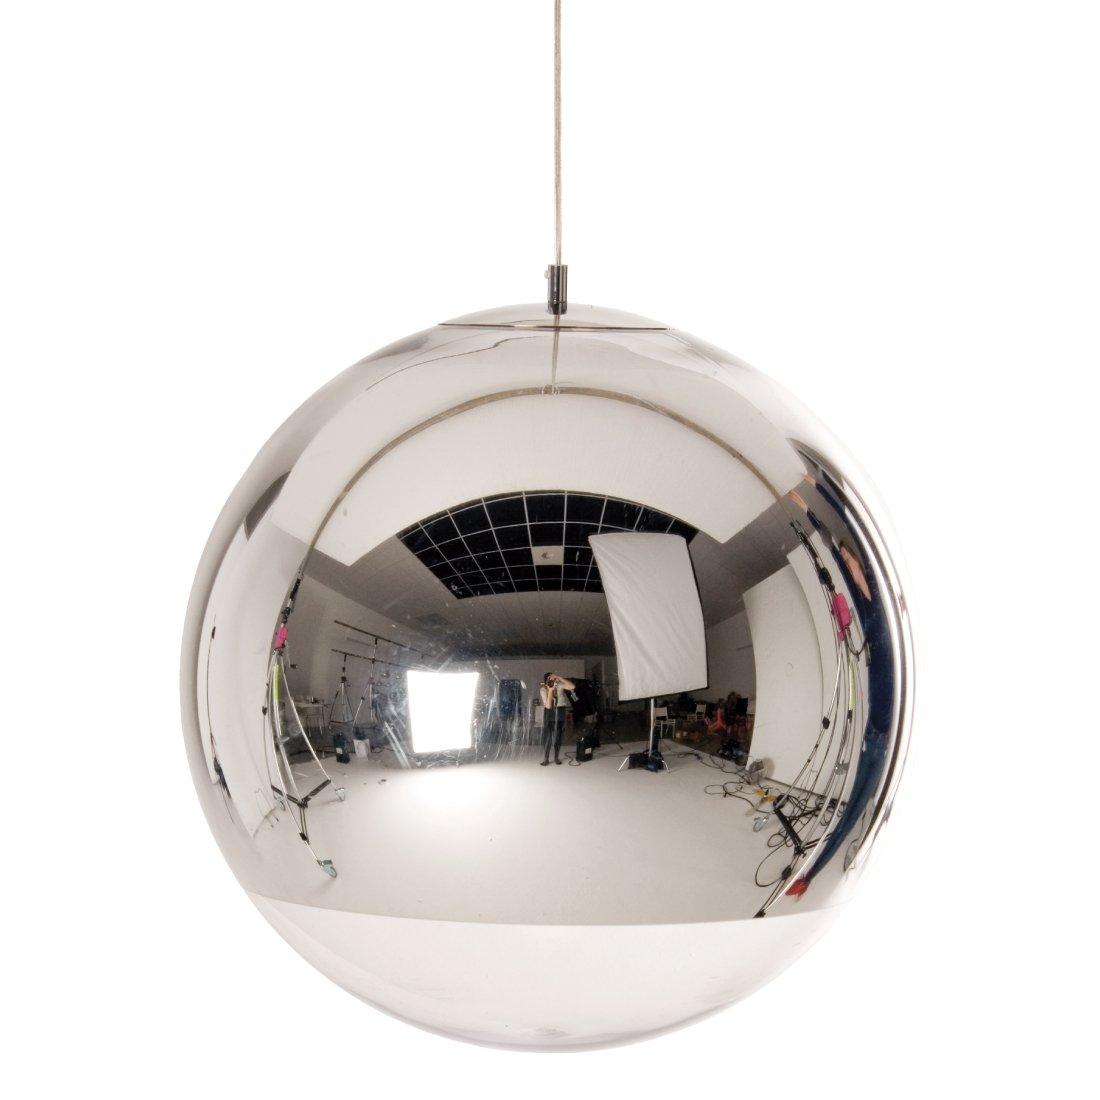 Mirror Ball Chrome Hanglamp - Tom Dixon